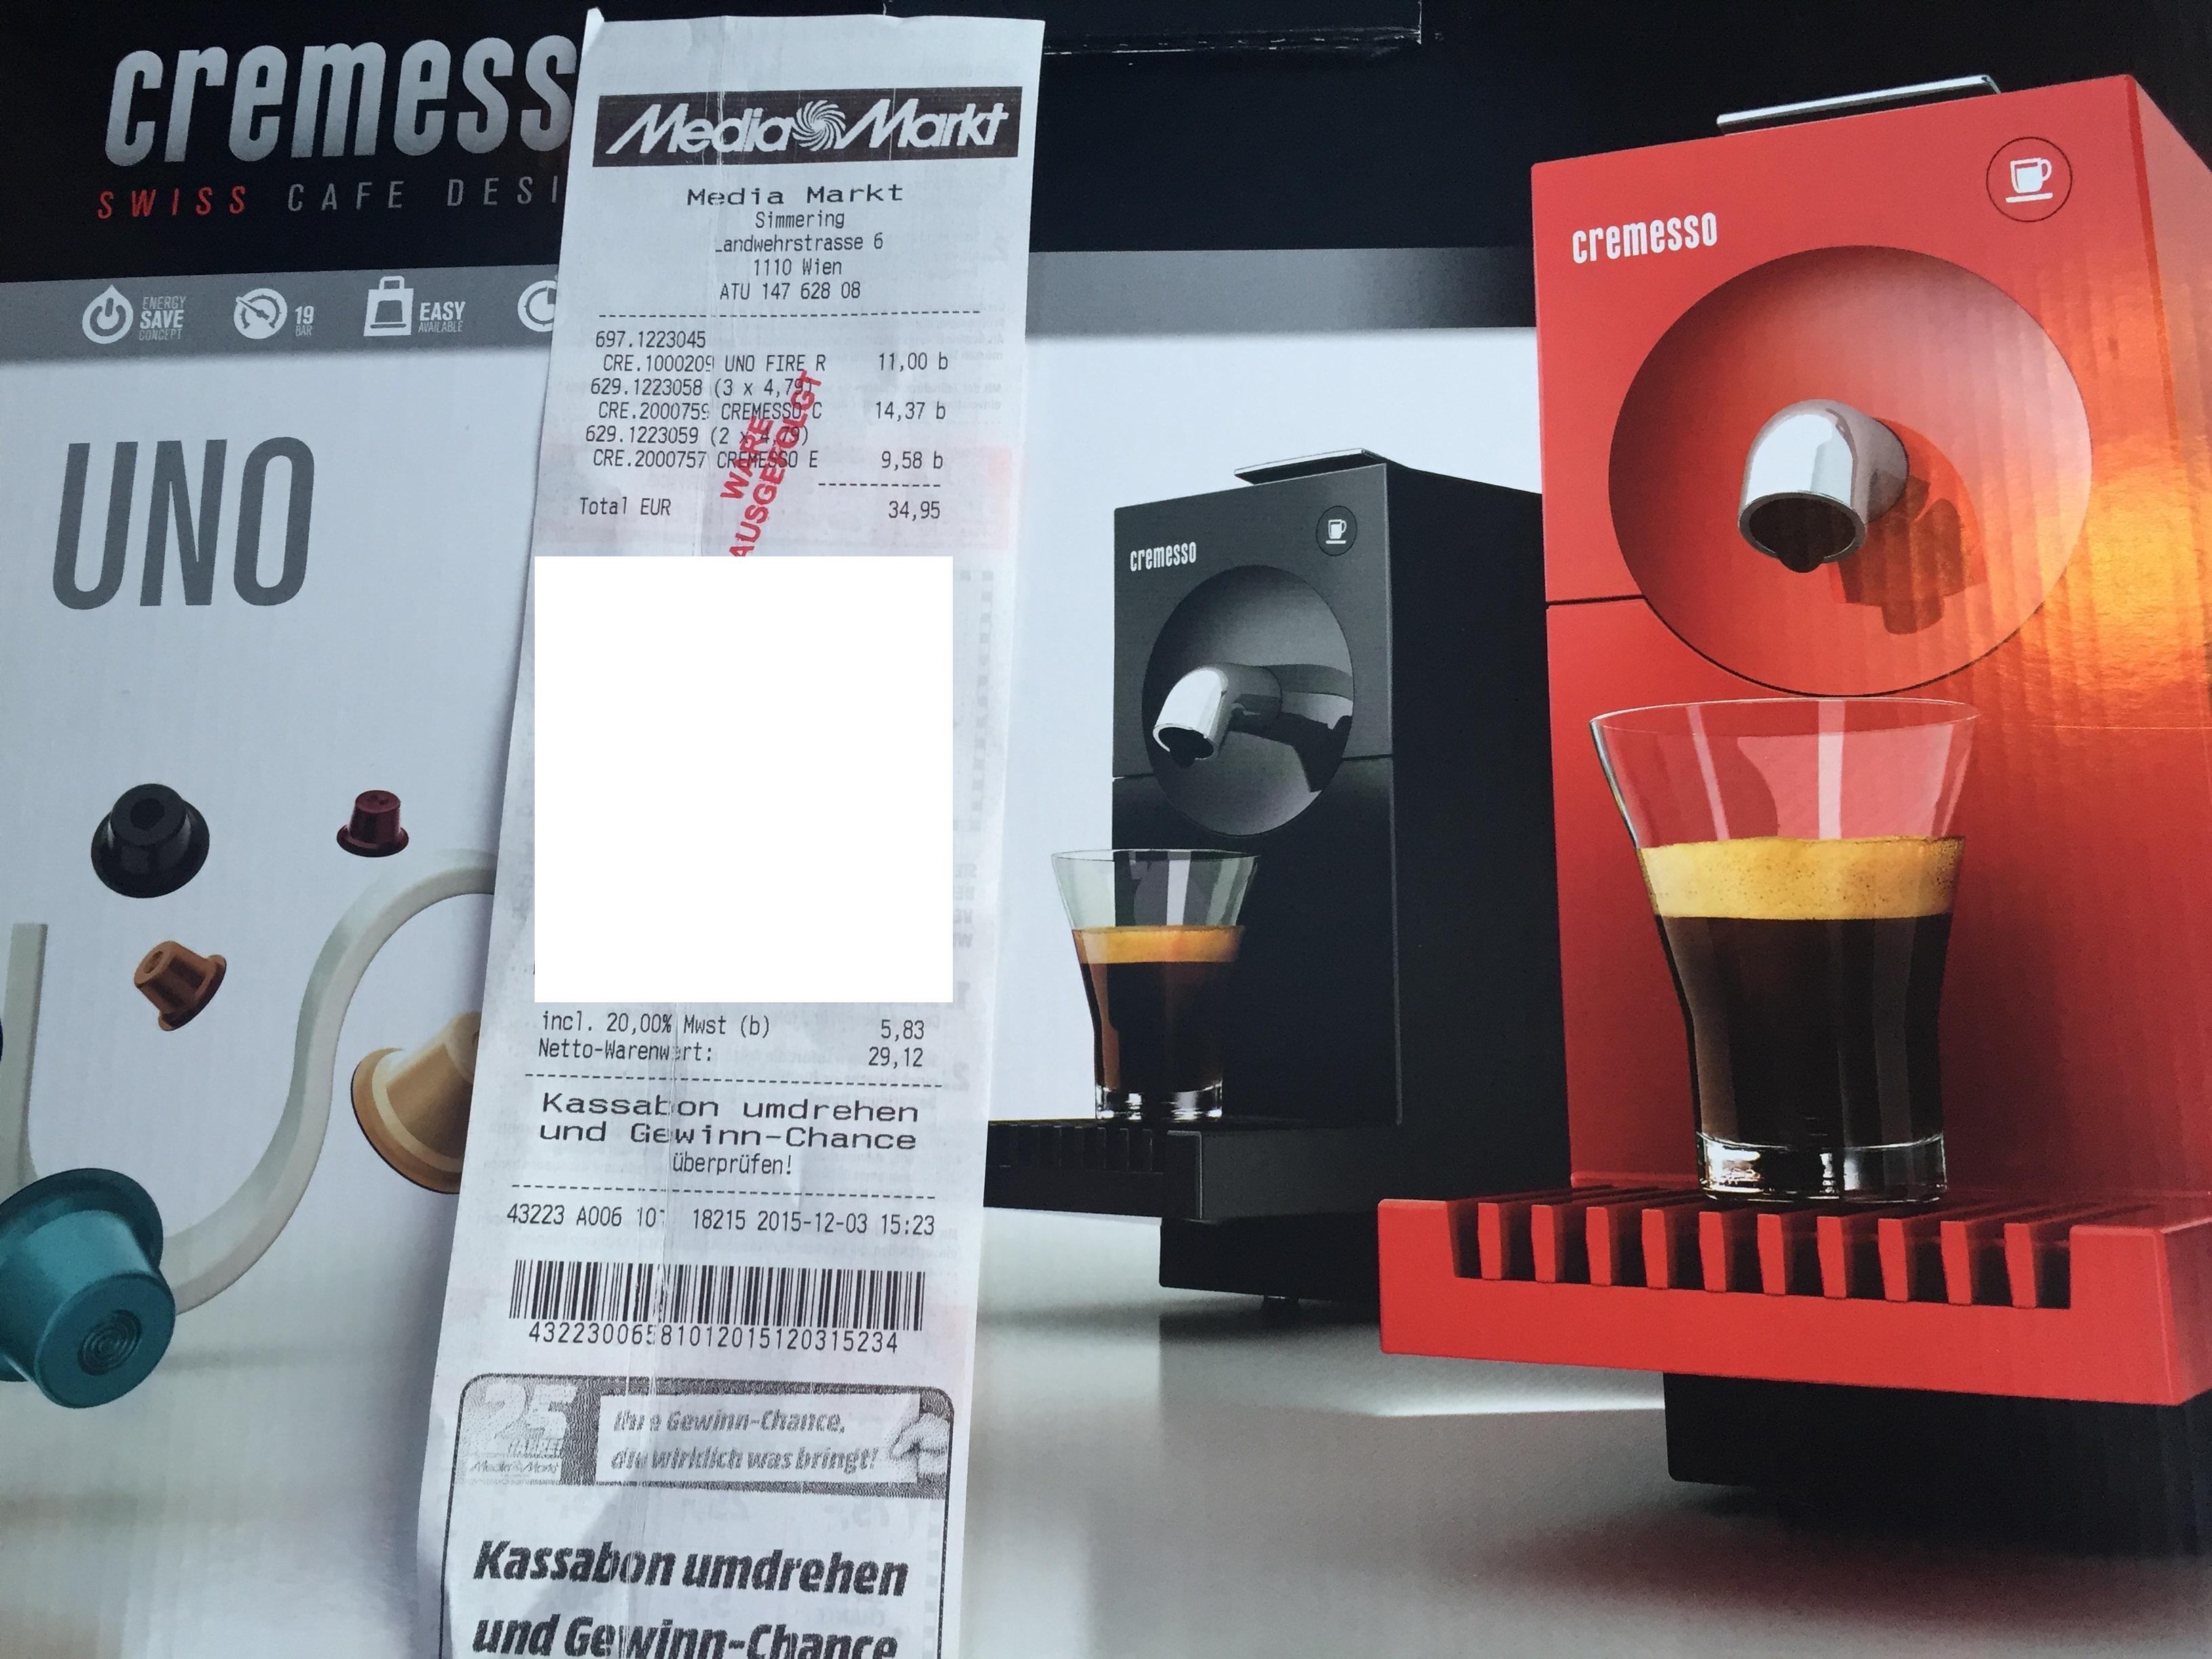 Media Mart Simmering - Cremesso Uno um 11 € - statt 39-48 €